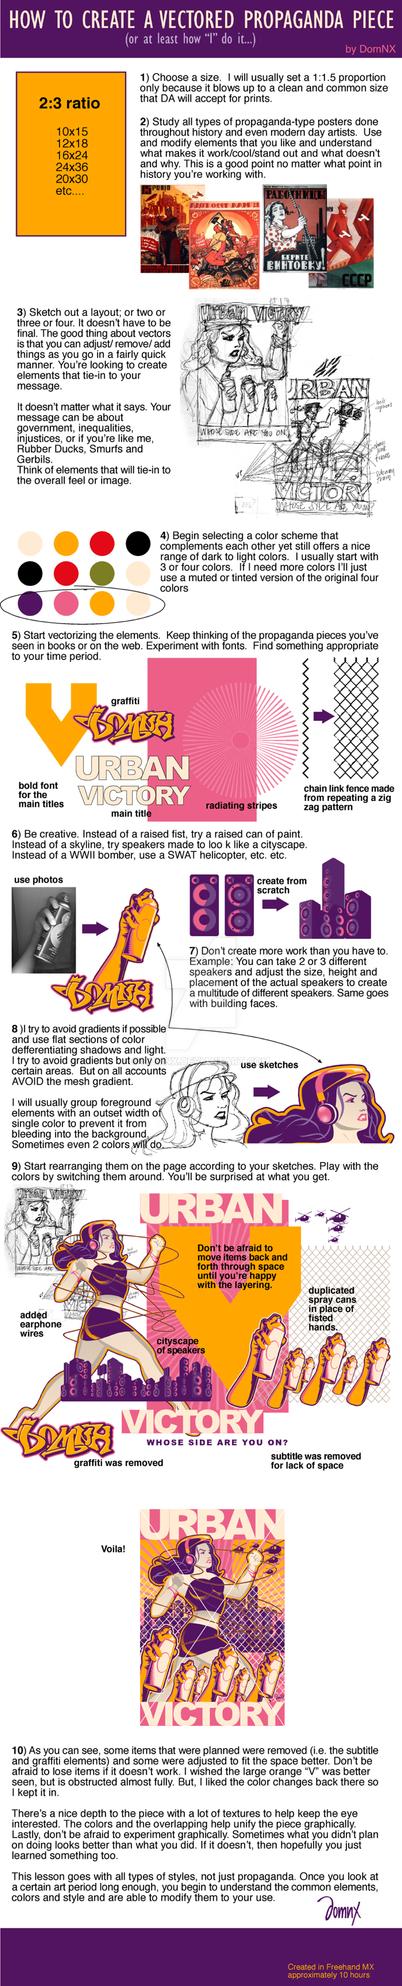 Urban Propaganda How-To by DomNX